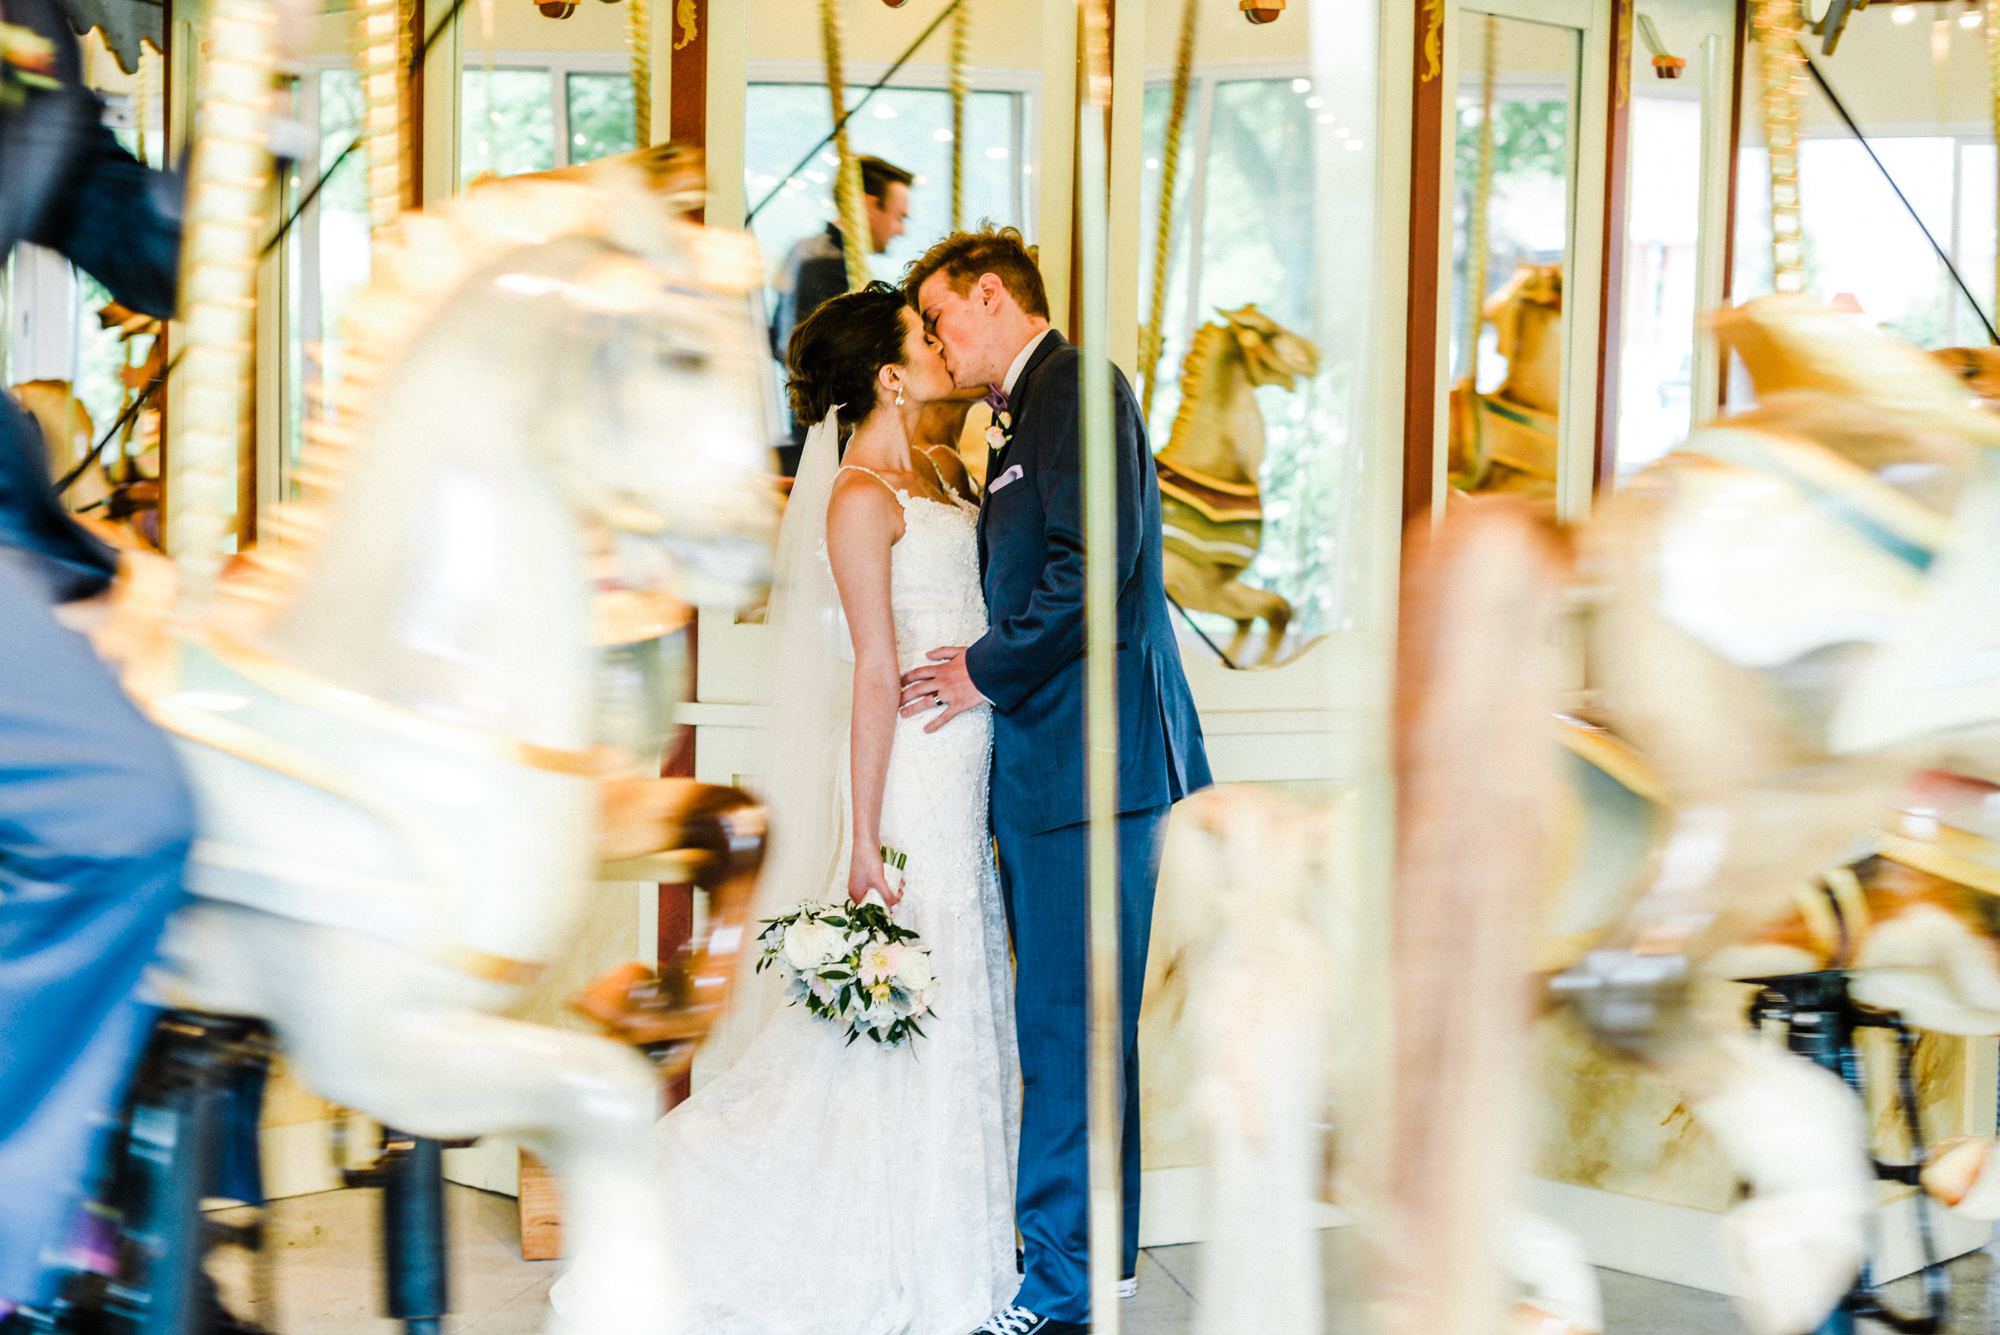 saratoga-springs-new-york-national-museum-of-dance-film-wedding-photographer-27.jpg